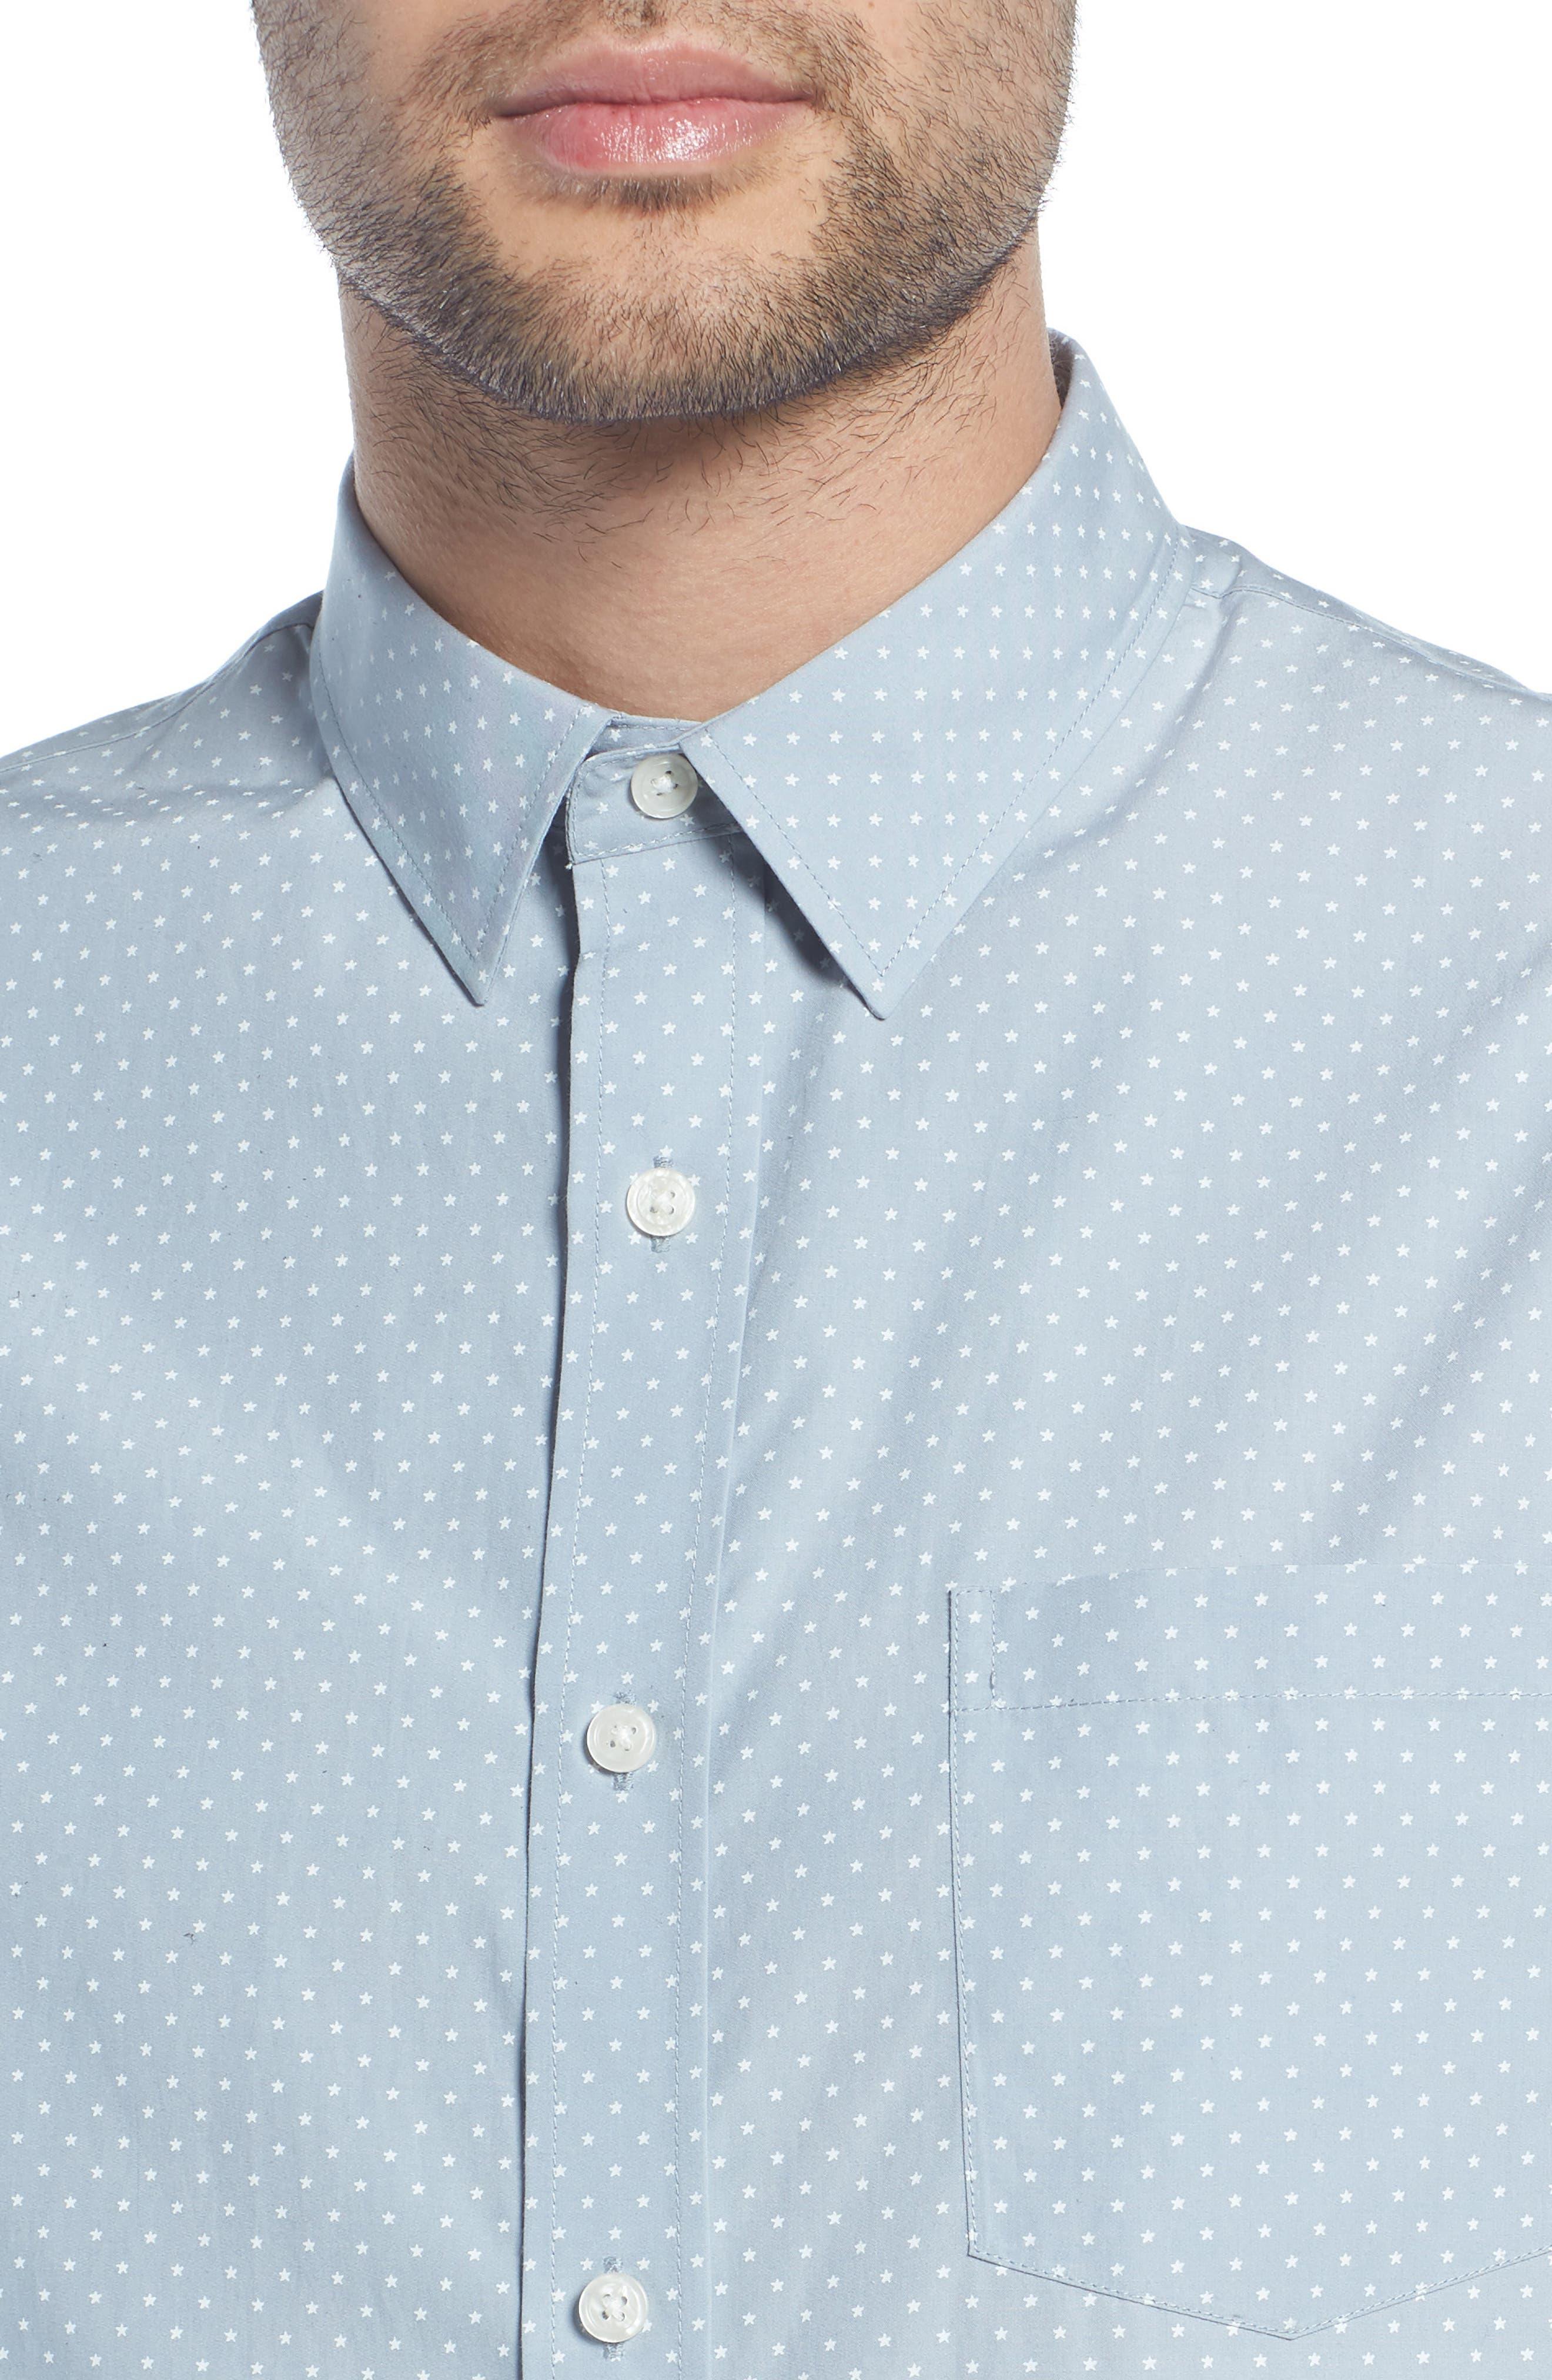 Classic Fit Micro Star Short Sleeve Sport Shirt,                             Alternate thumbnail 4, color,                             ARCTIC